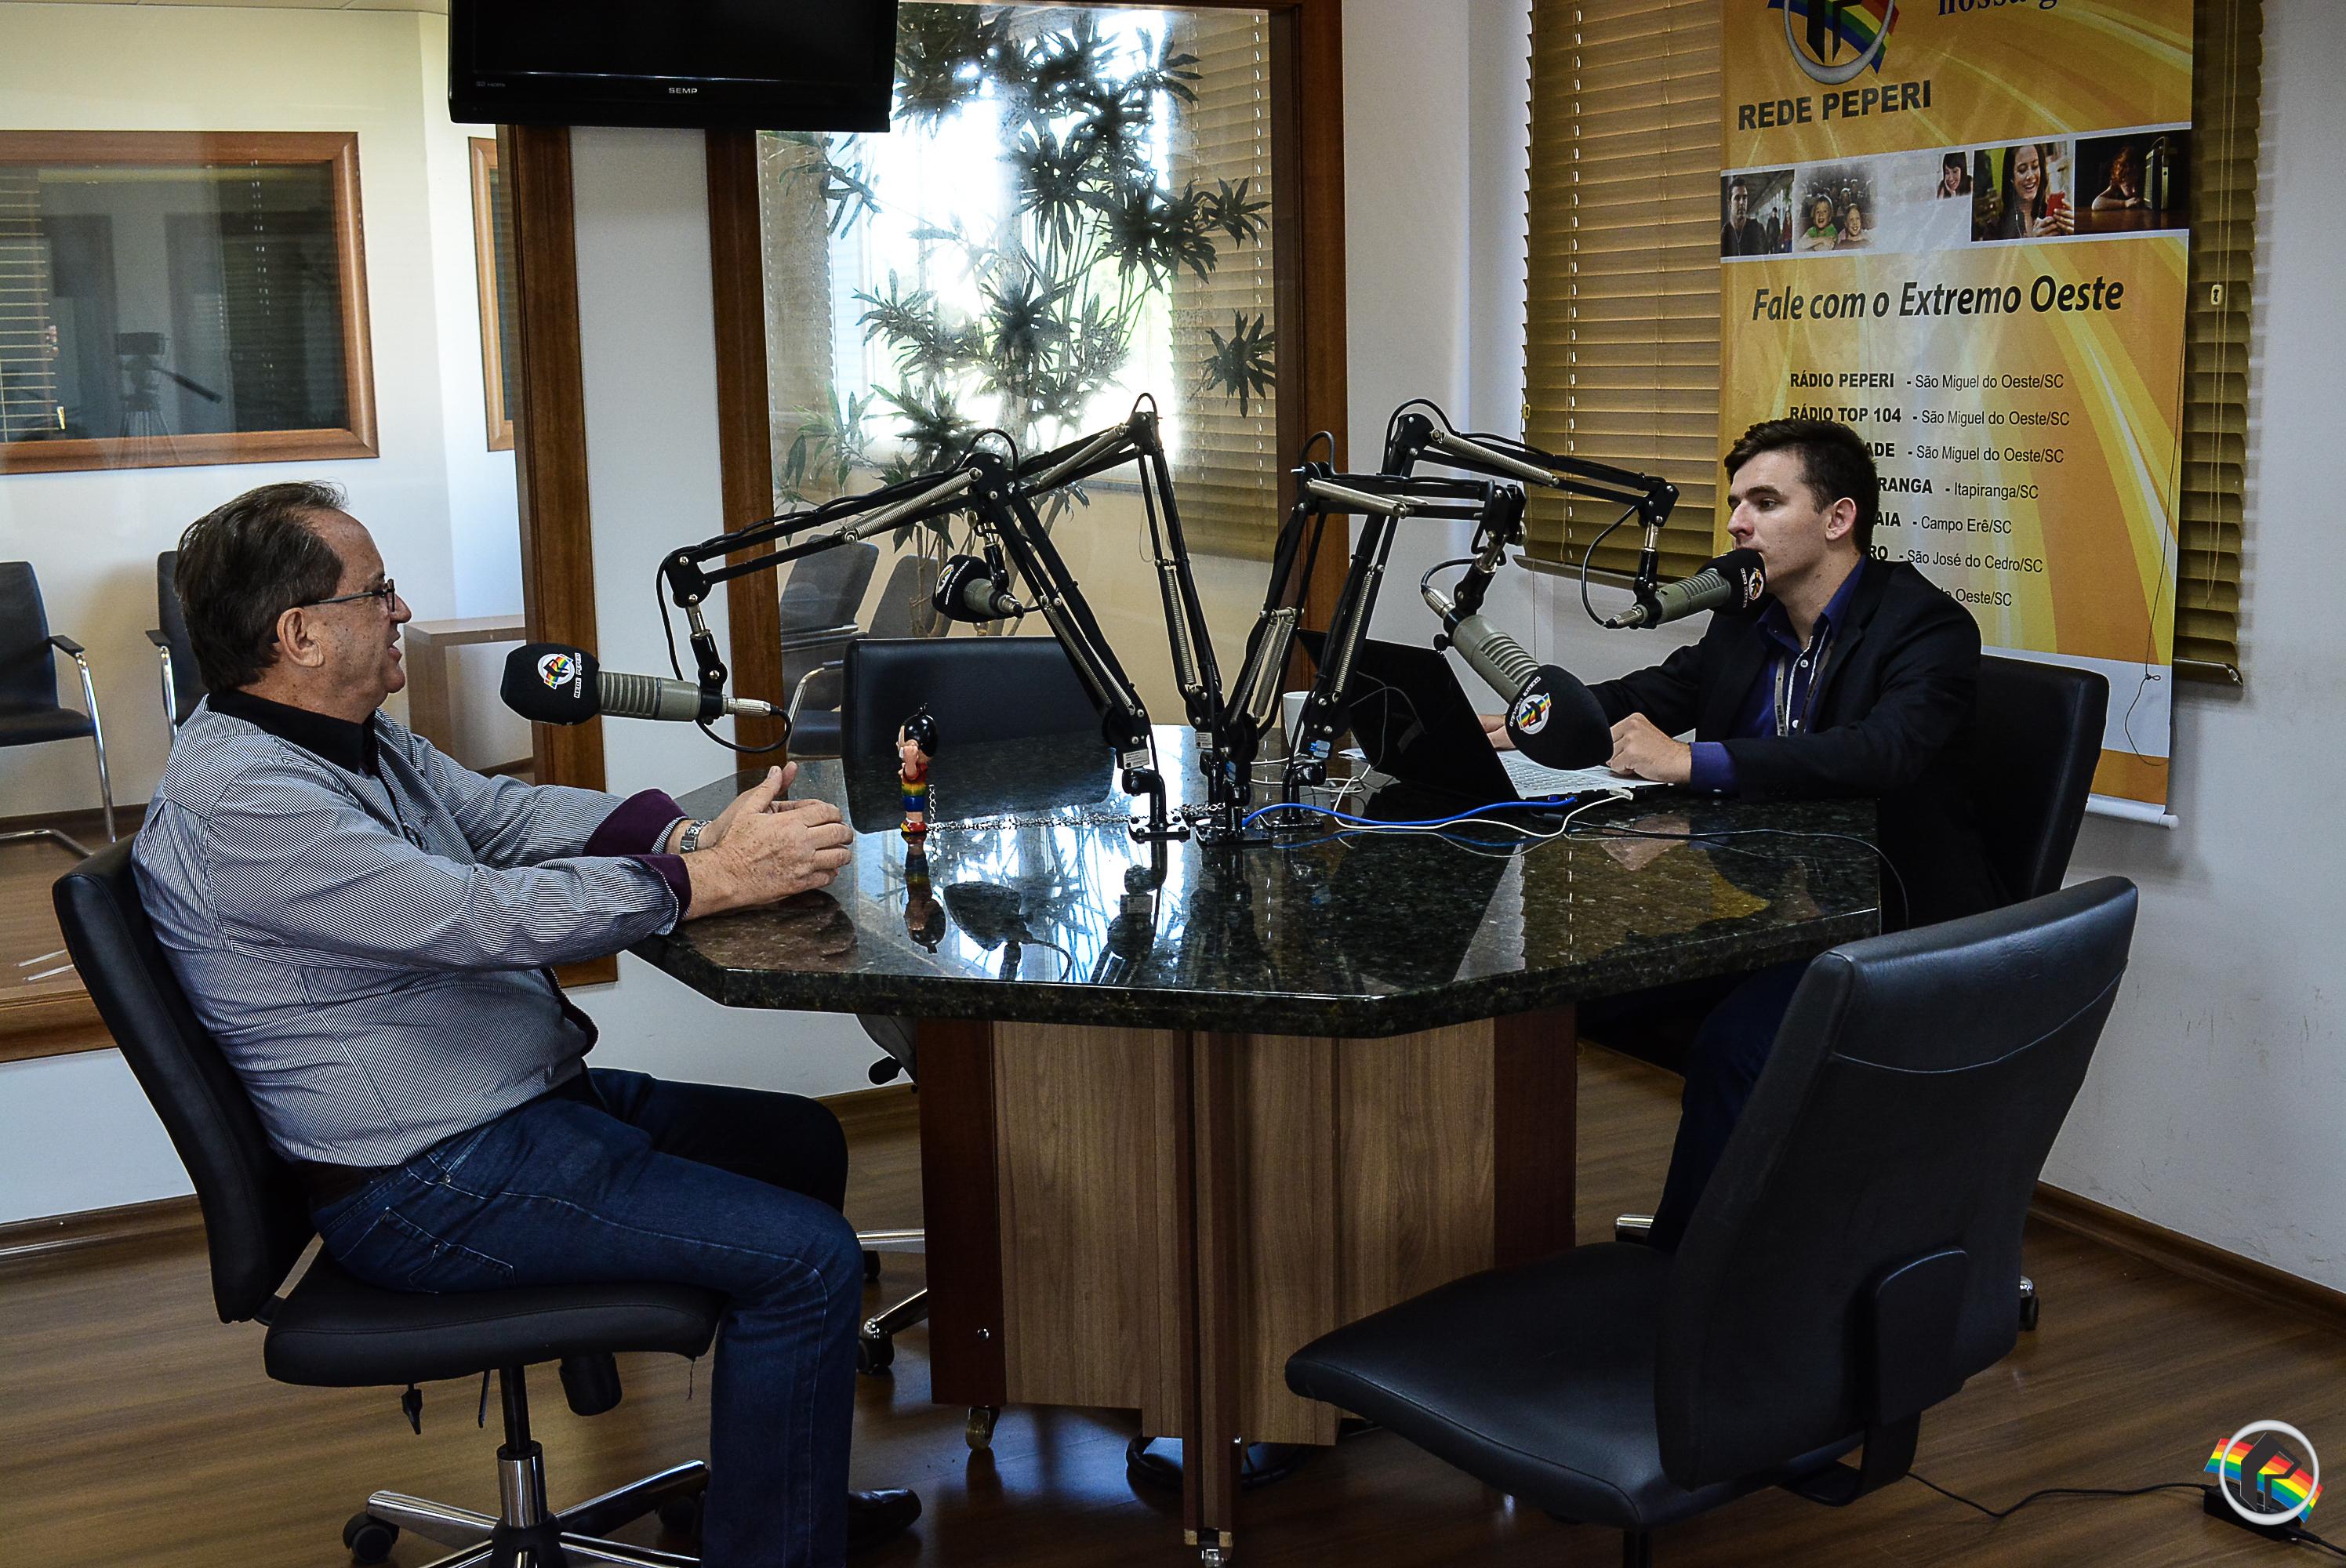 Peperi recebe o empresário Irineu Massarollo